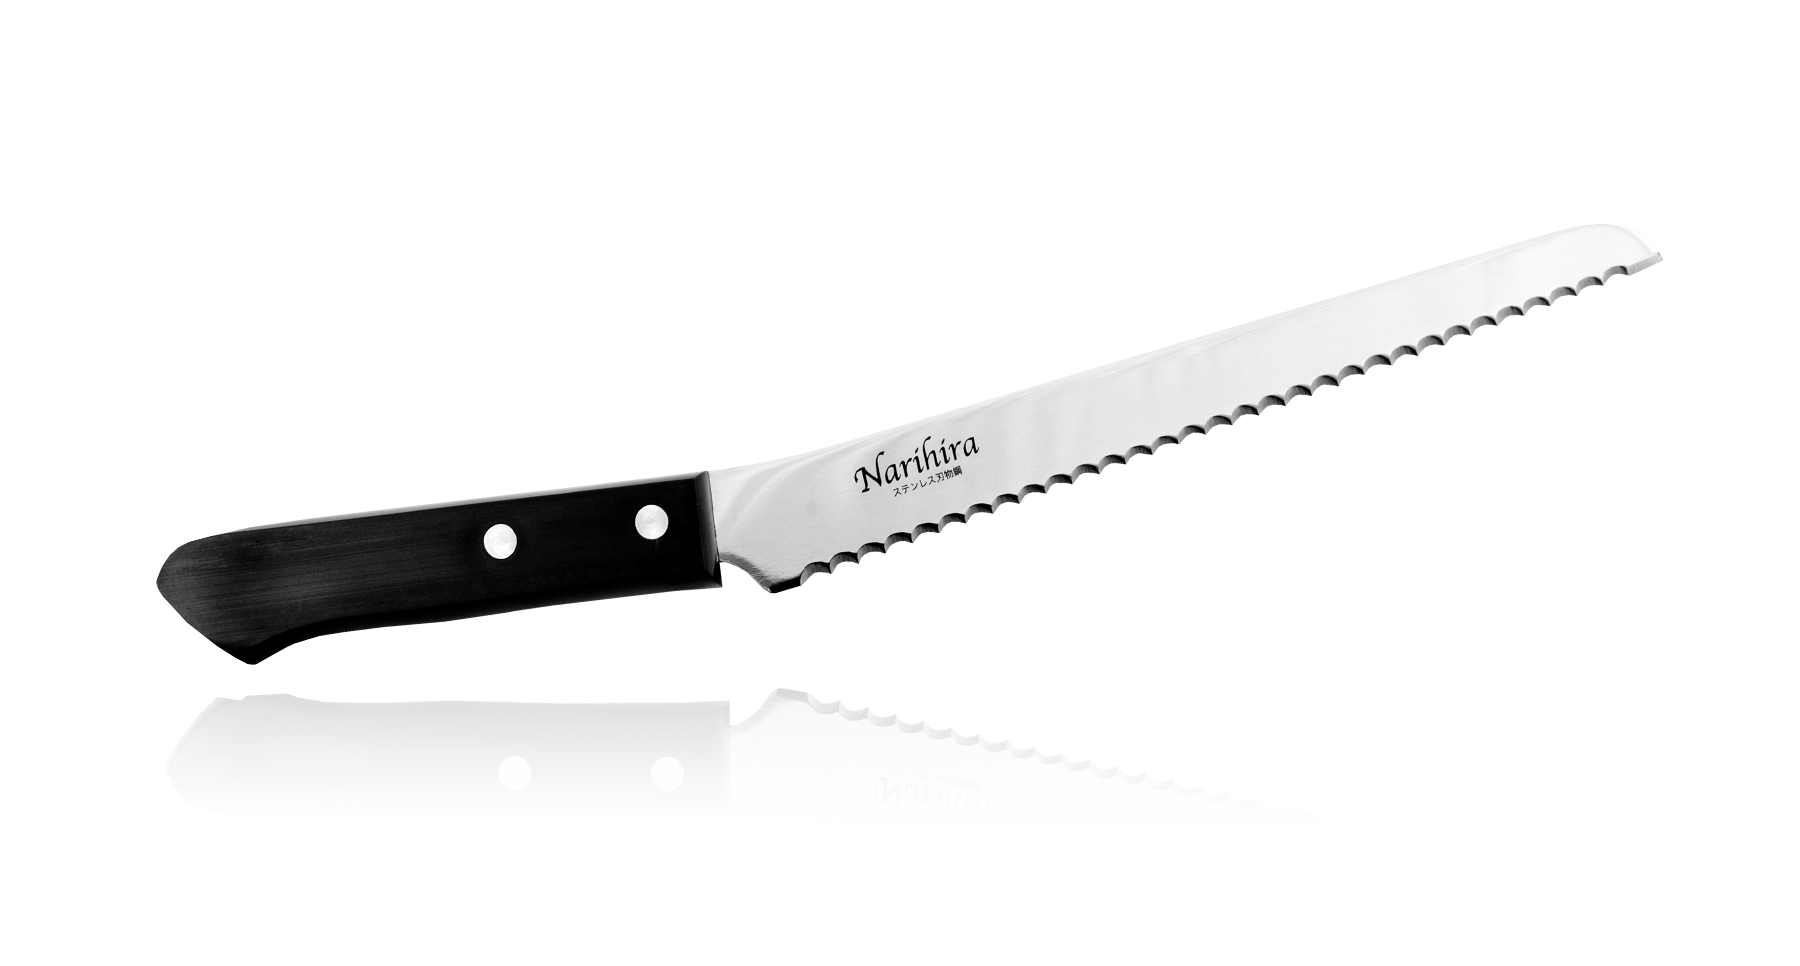 Нож для нарезки хлеба Narihira 200 мм, сталь AUS-8Tojiro<br>Нож для нарезки хлеба Narihira 200 мм, сталь AUS-8<br>